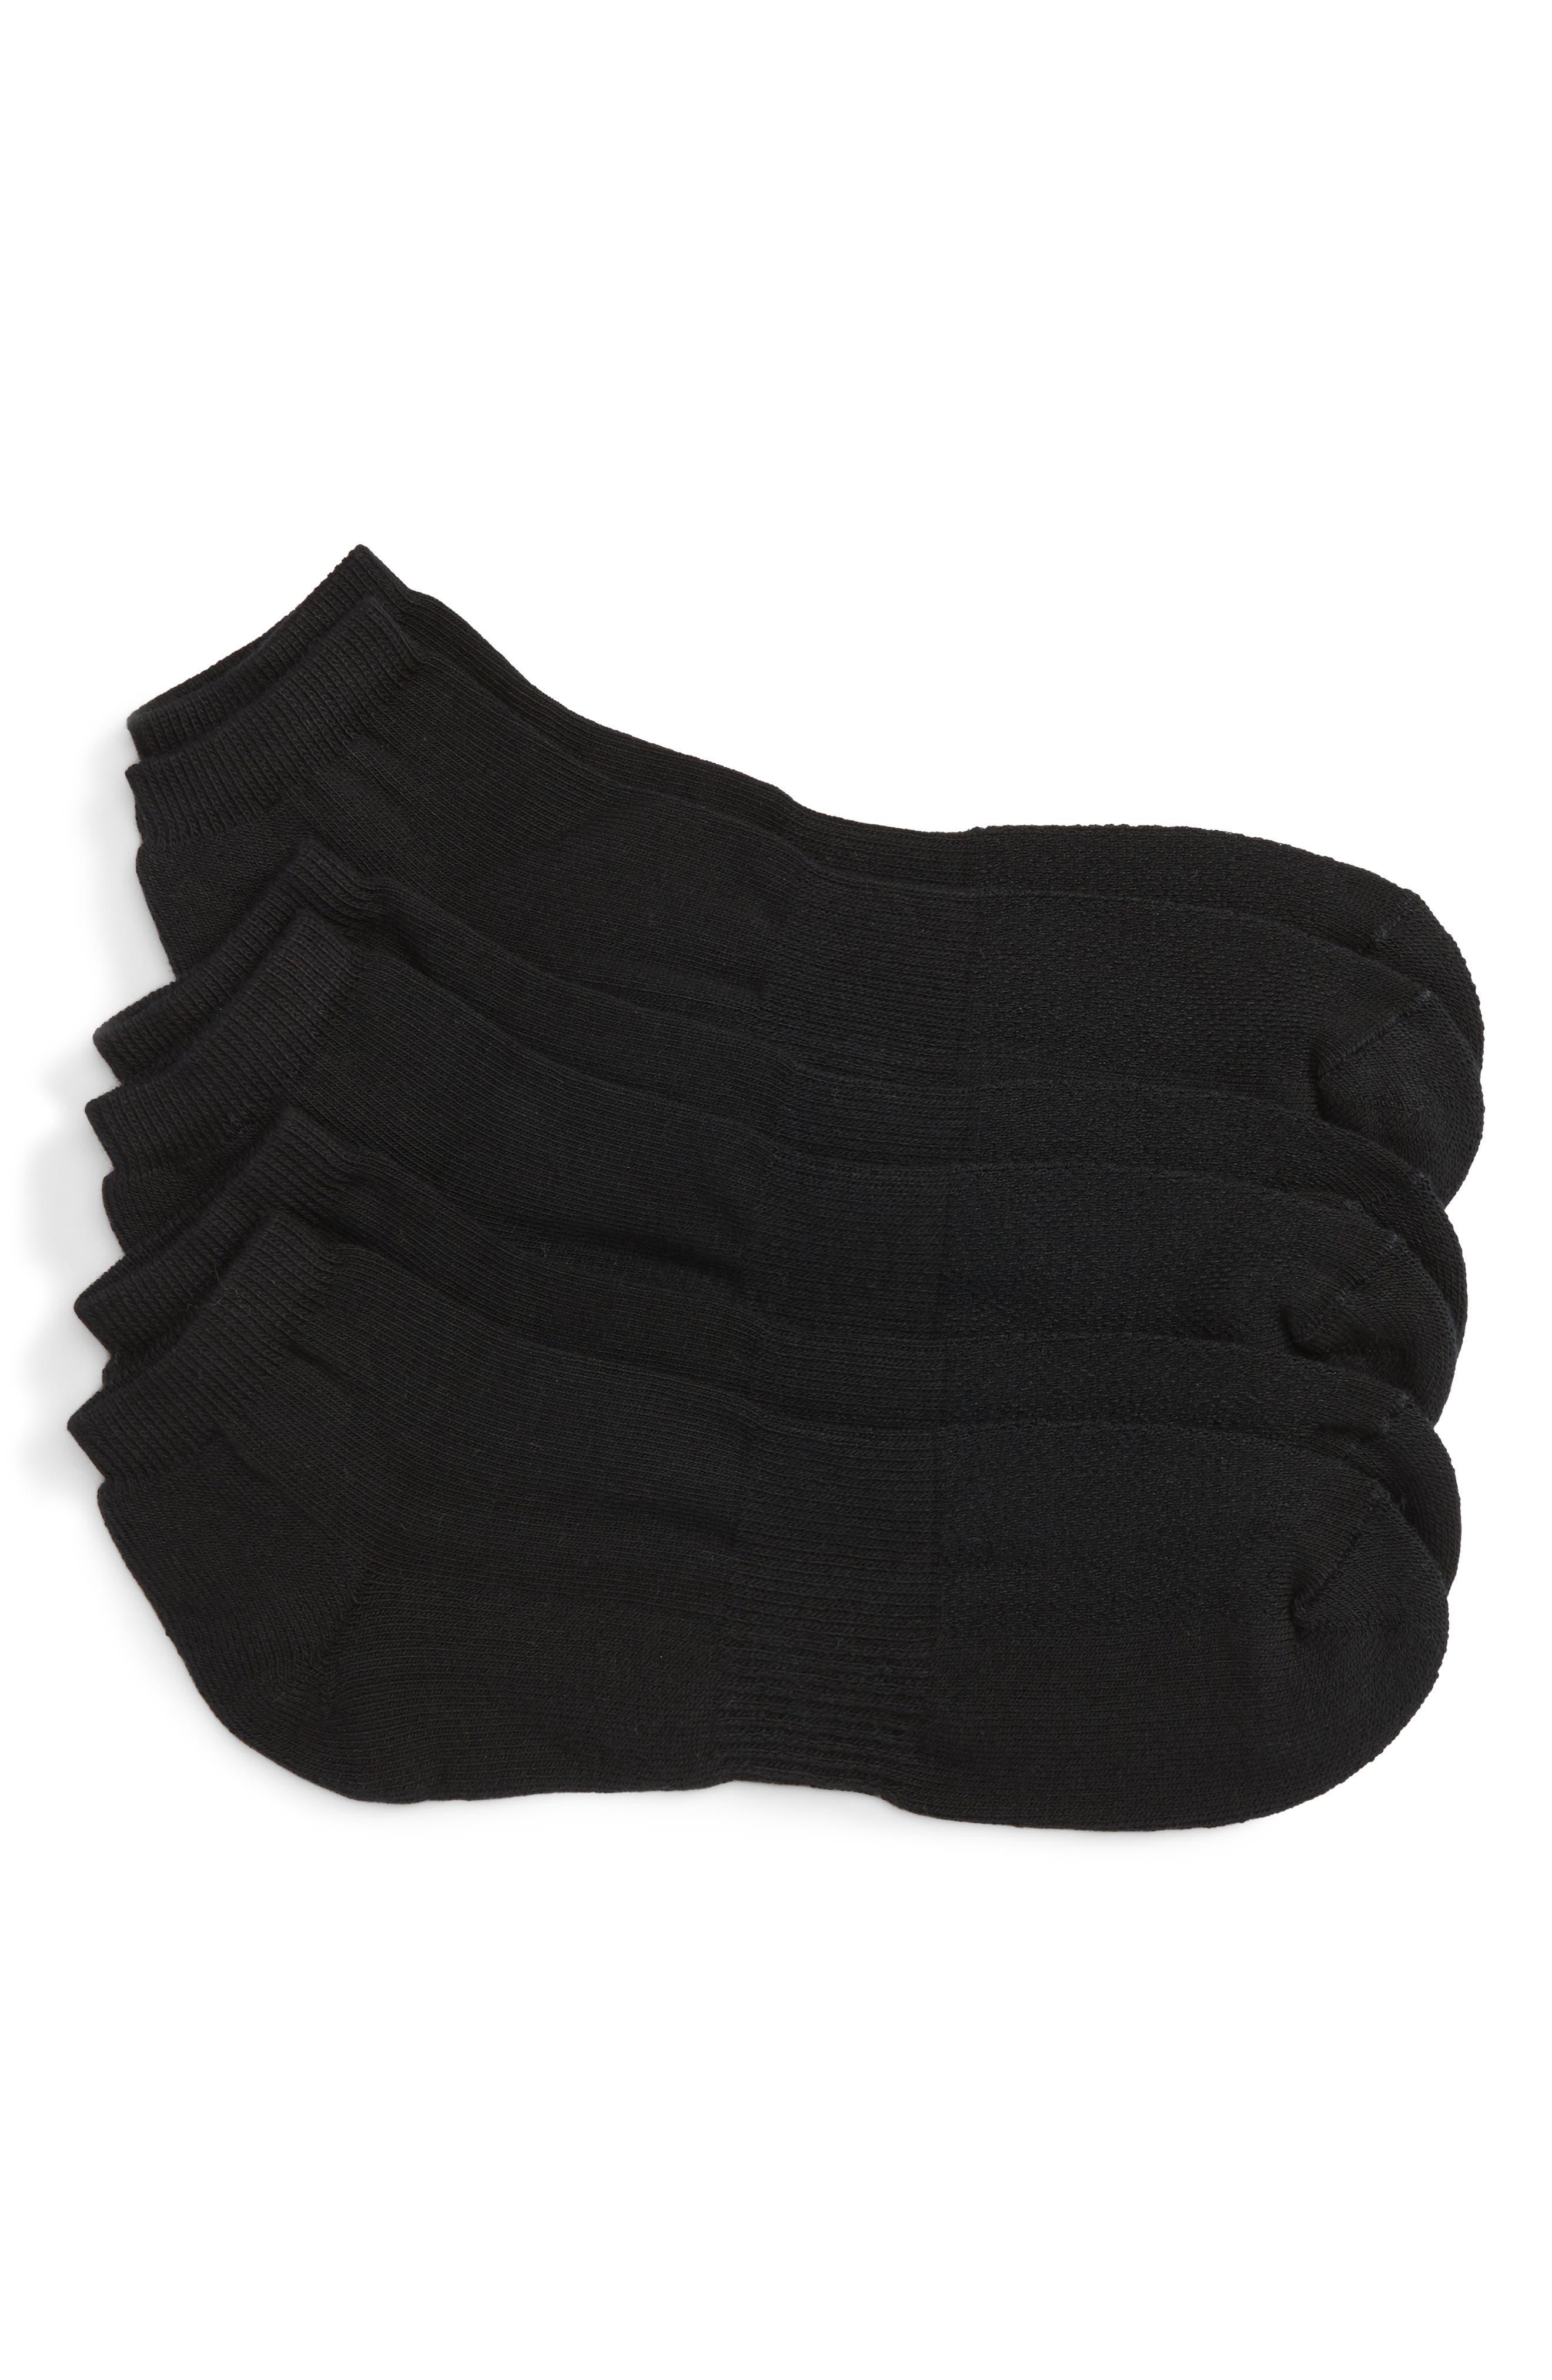 3-Pack No-Show Athletic Socks,                             Main thumbnail 1, color,                             Black